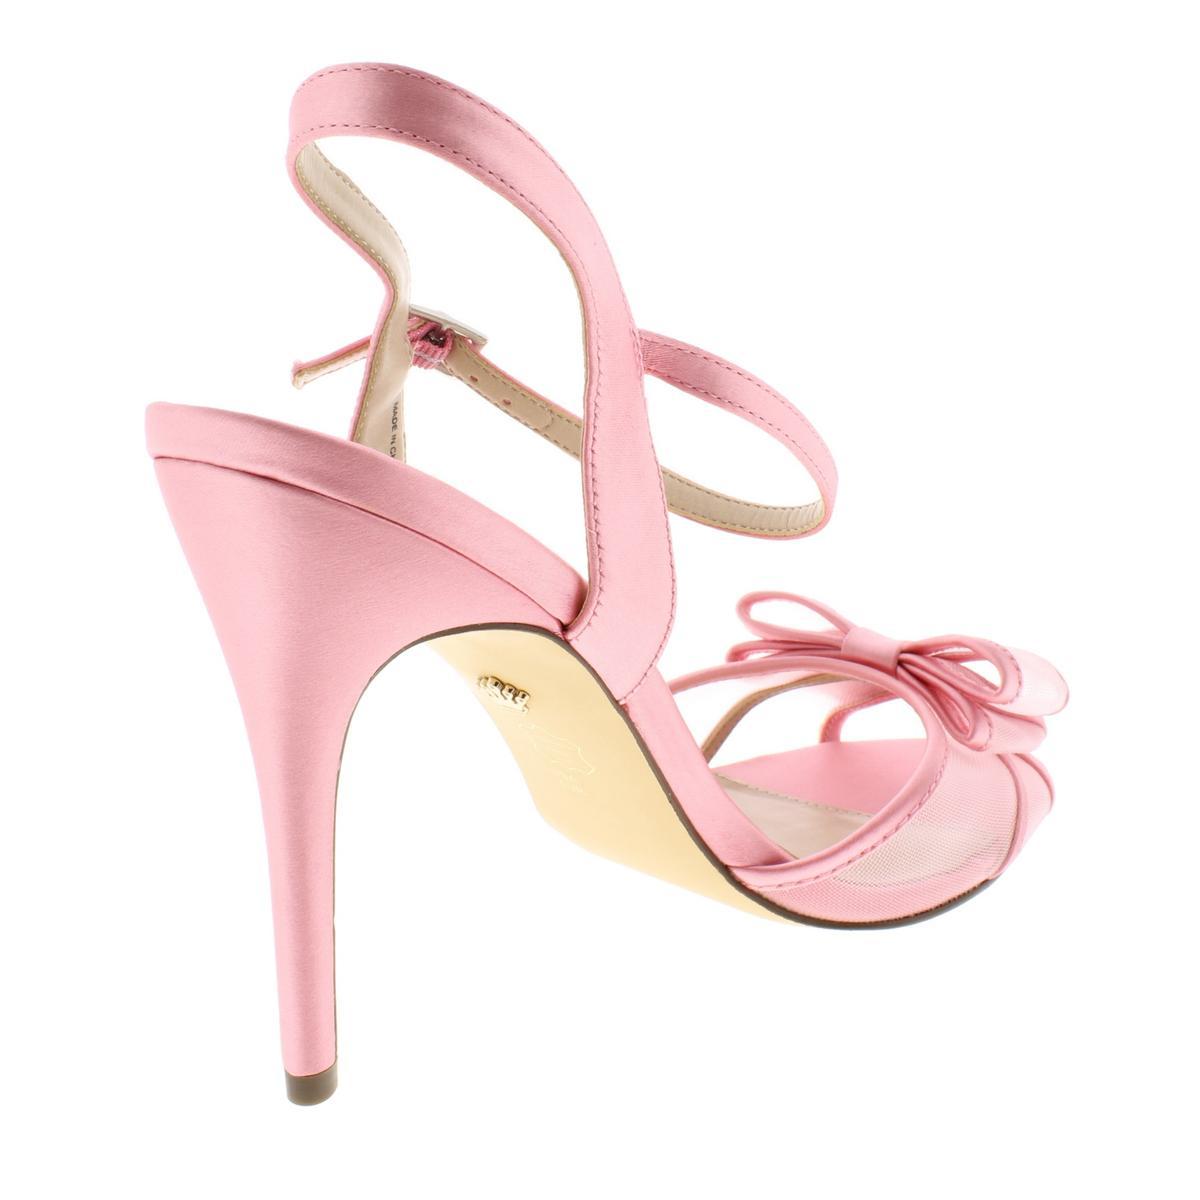 Nina-Womens-Charm-Satin-Dress-Ankle-Strap-Evening-Sandals-Heels-BHFO-9510 thumbnail 4